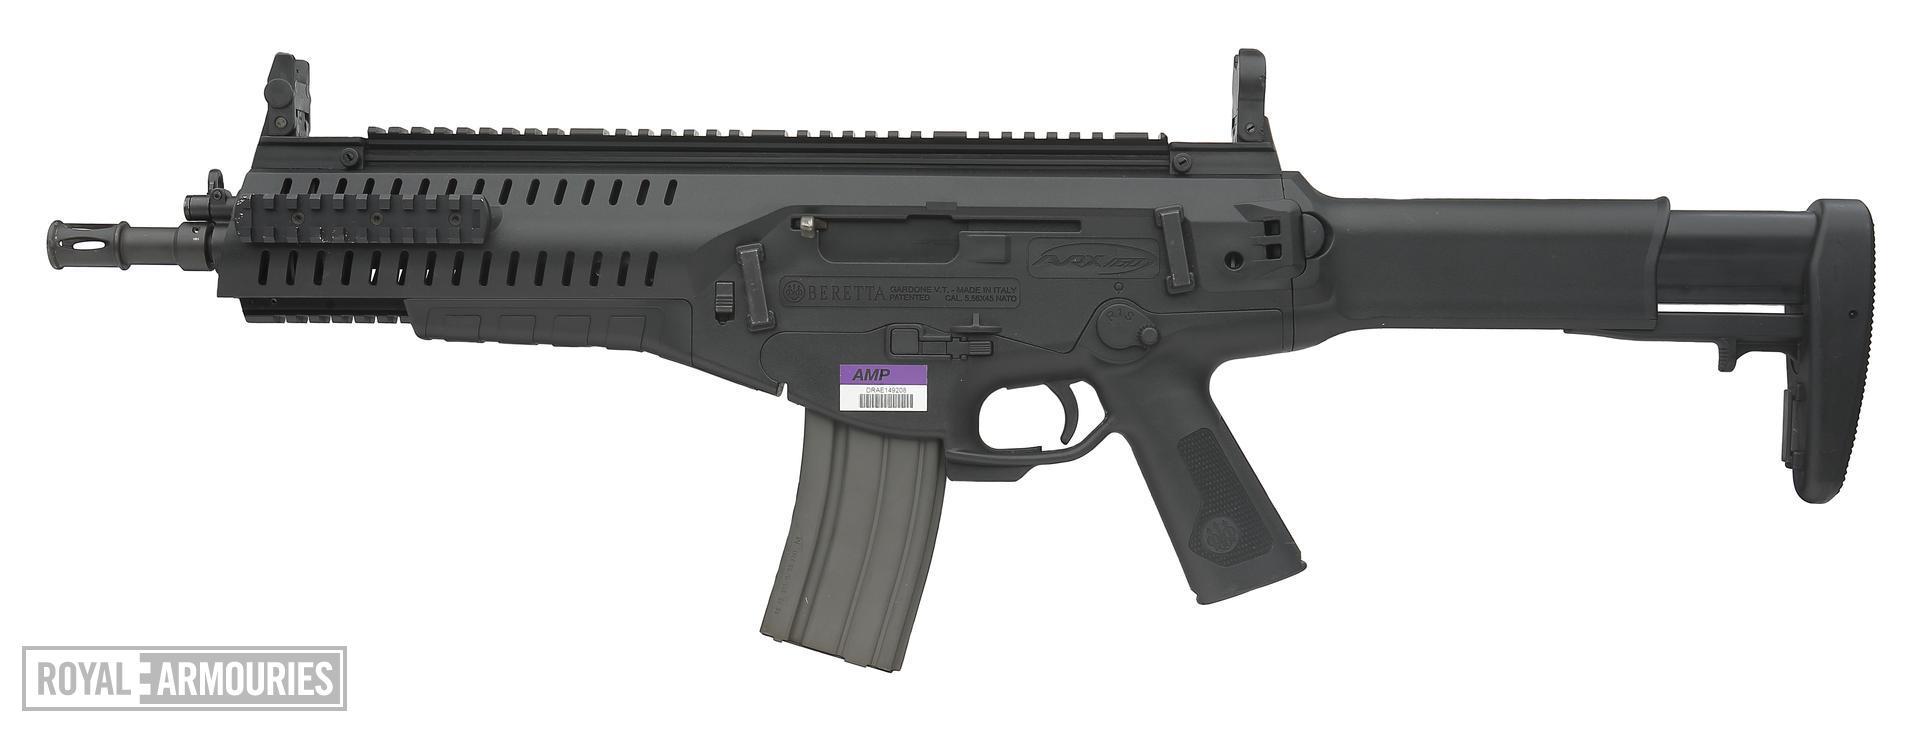 Centrefire automatic carbine - Beretta ARX-160